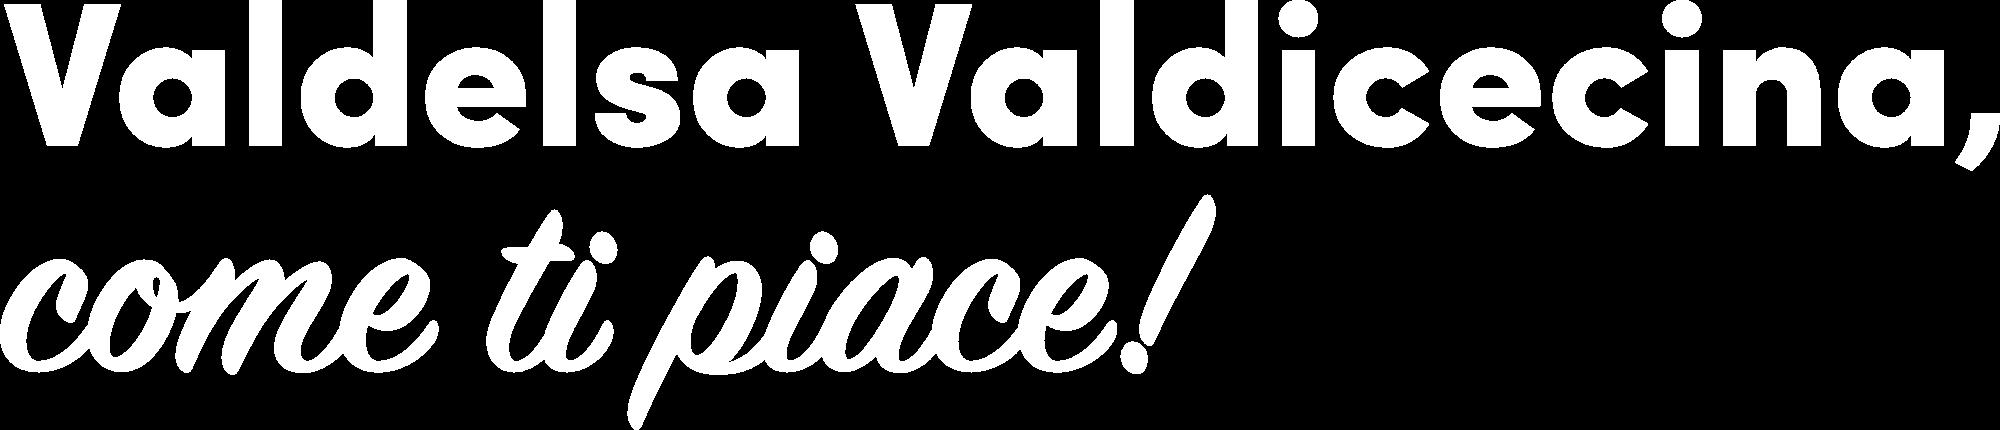 VEV-ctp-logo